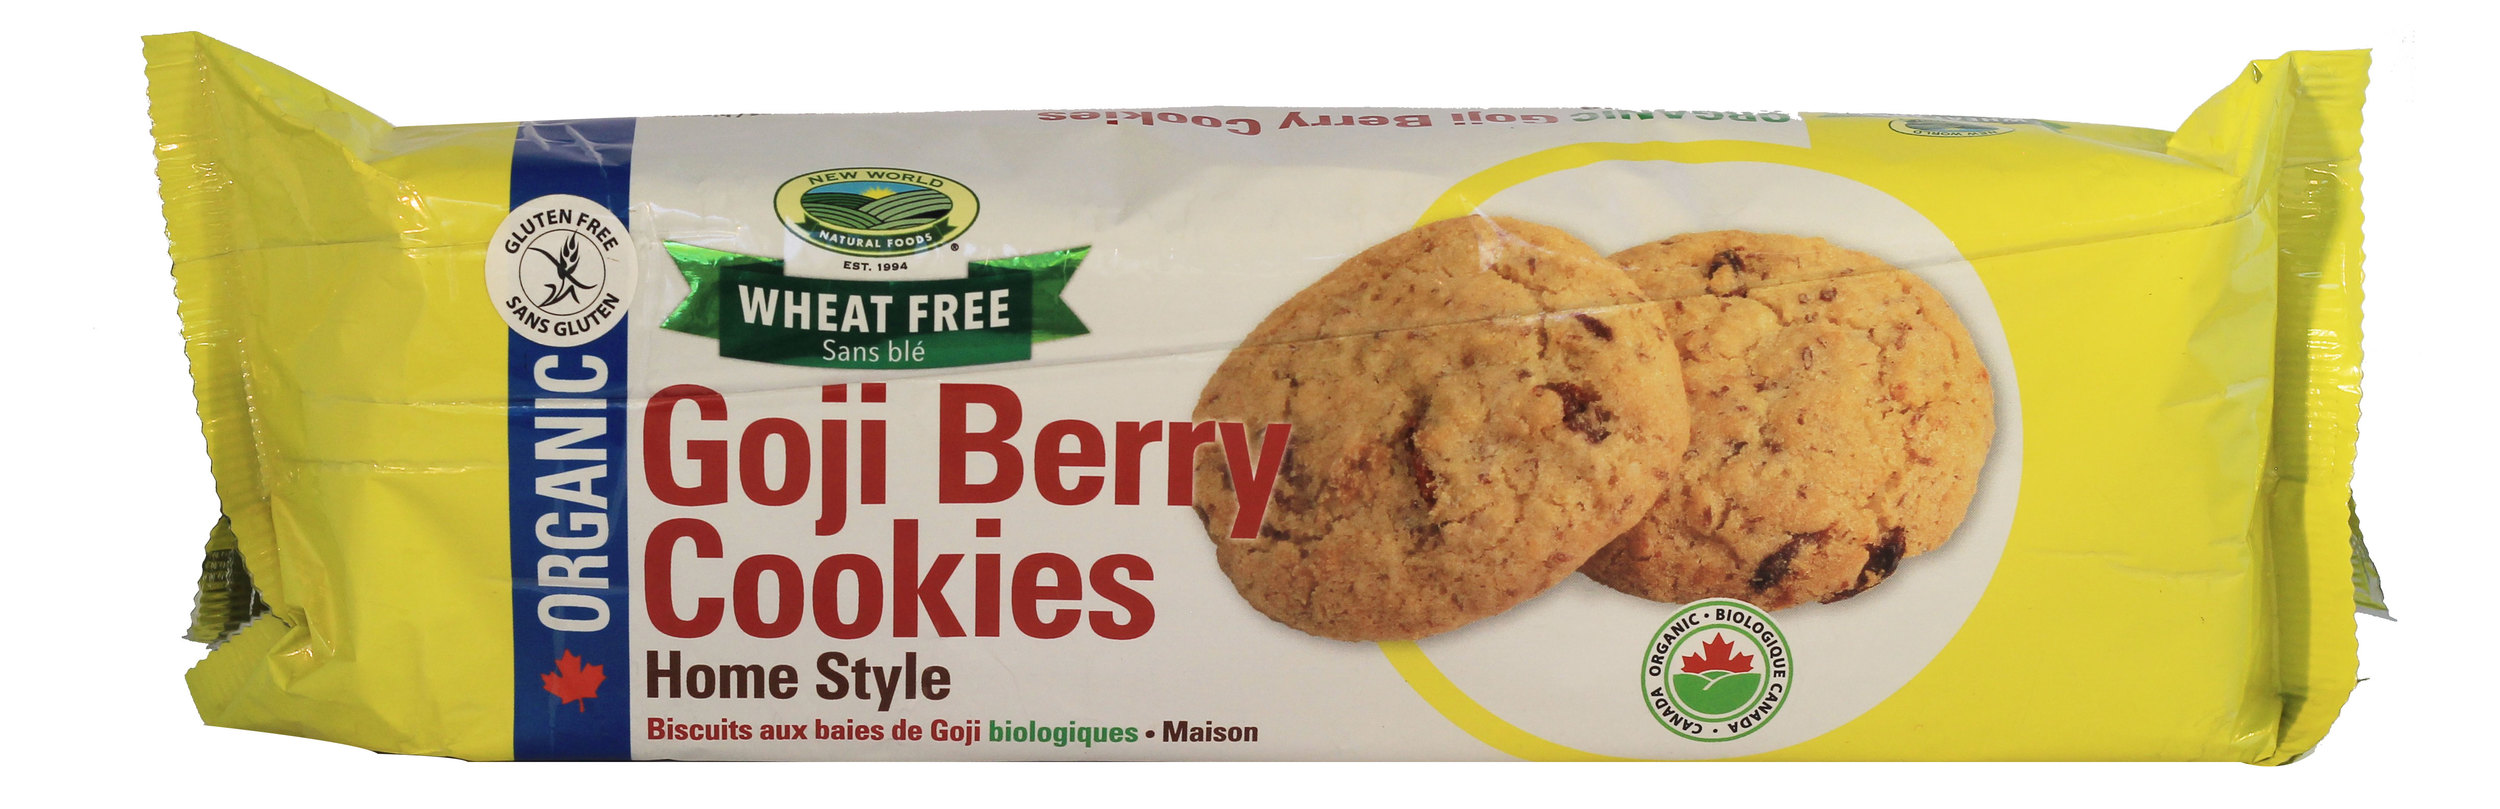 Gluten Free Goji Berry Cookies